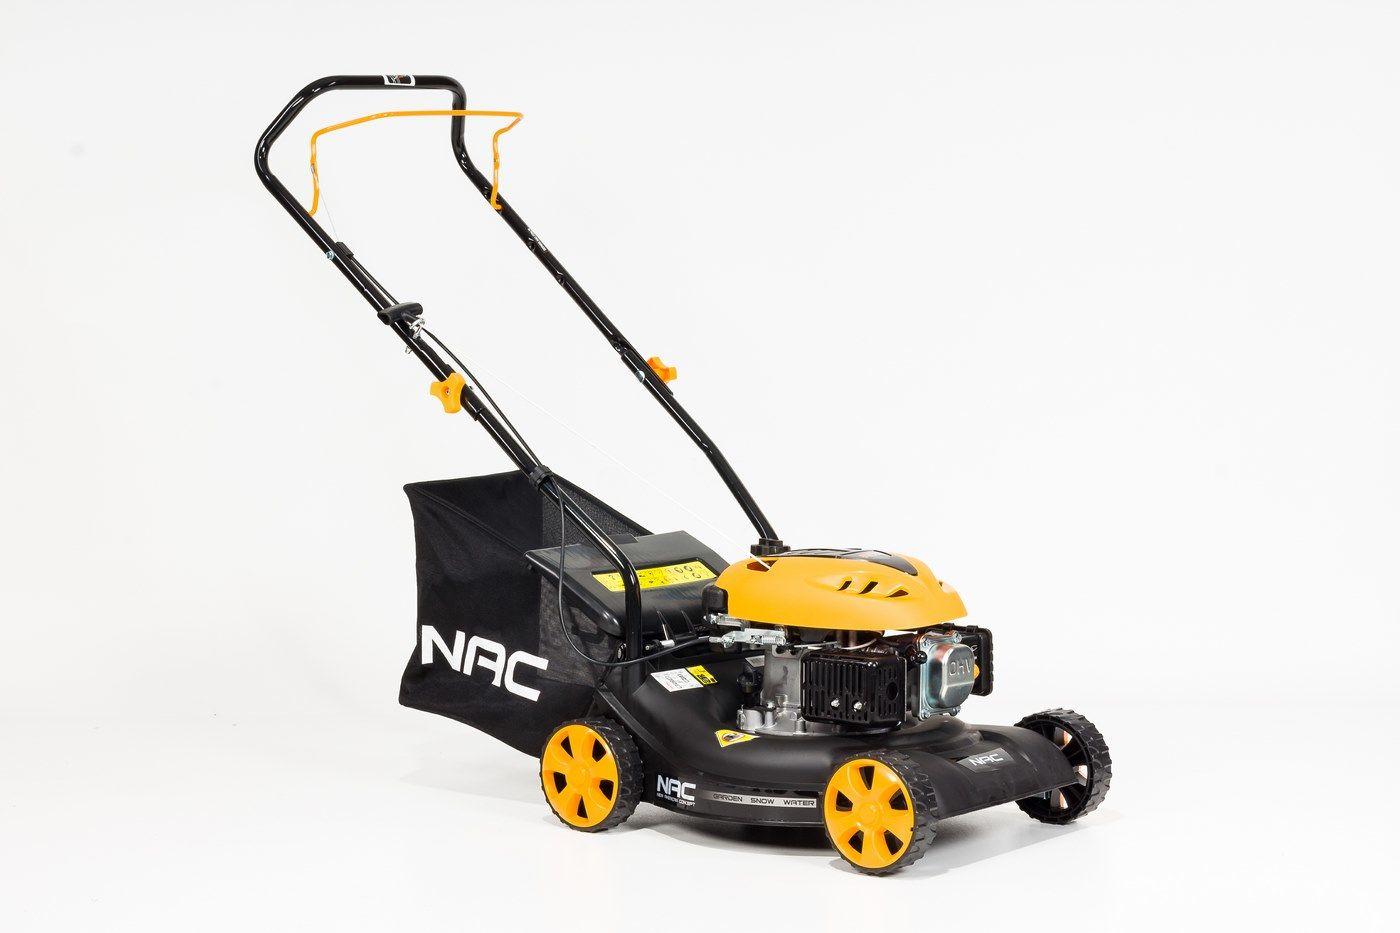 NAC LP40-79-PL-SB